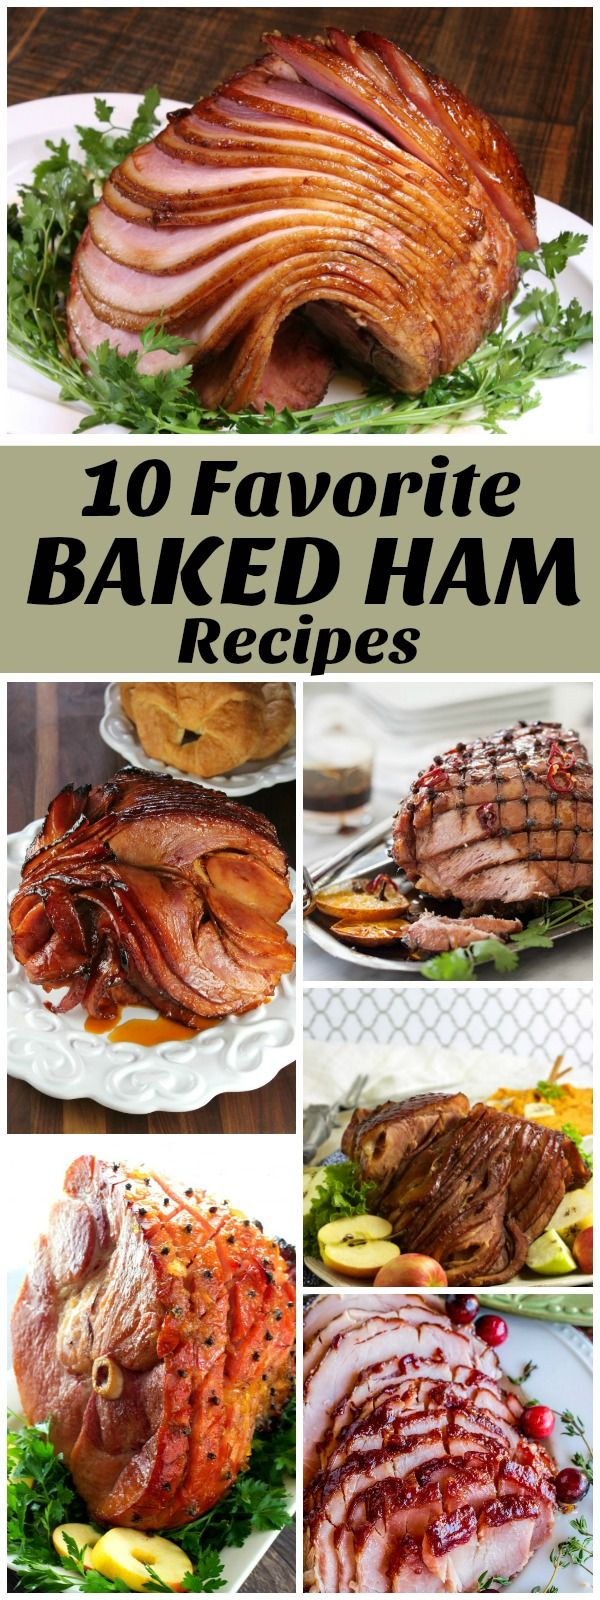 10 Favorite Baked Ham Recipes: including classic Brown Sugar Glazed Ham, Bourbon Orange Glazed Ham, Cranberry Dijon Glazed Ham and more!